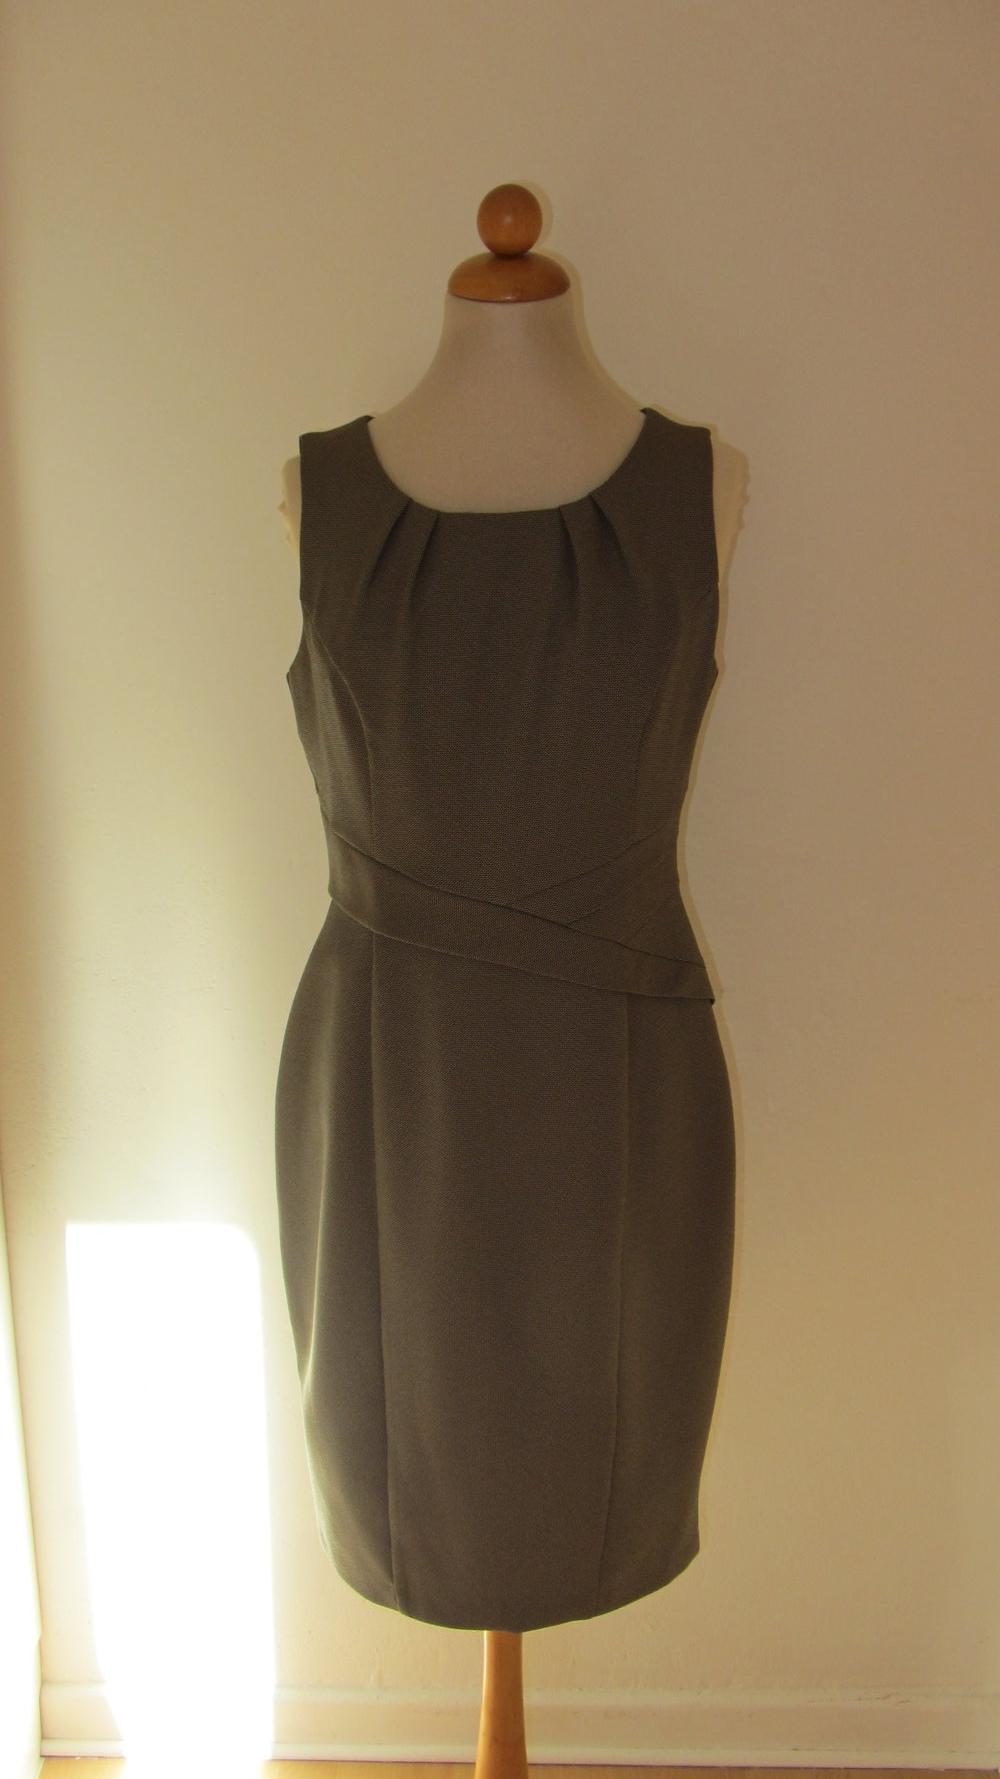 Abend-Kleid 38 - schmale 40 S M grau vintage-look retro stark ...